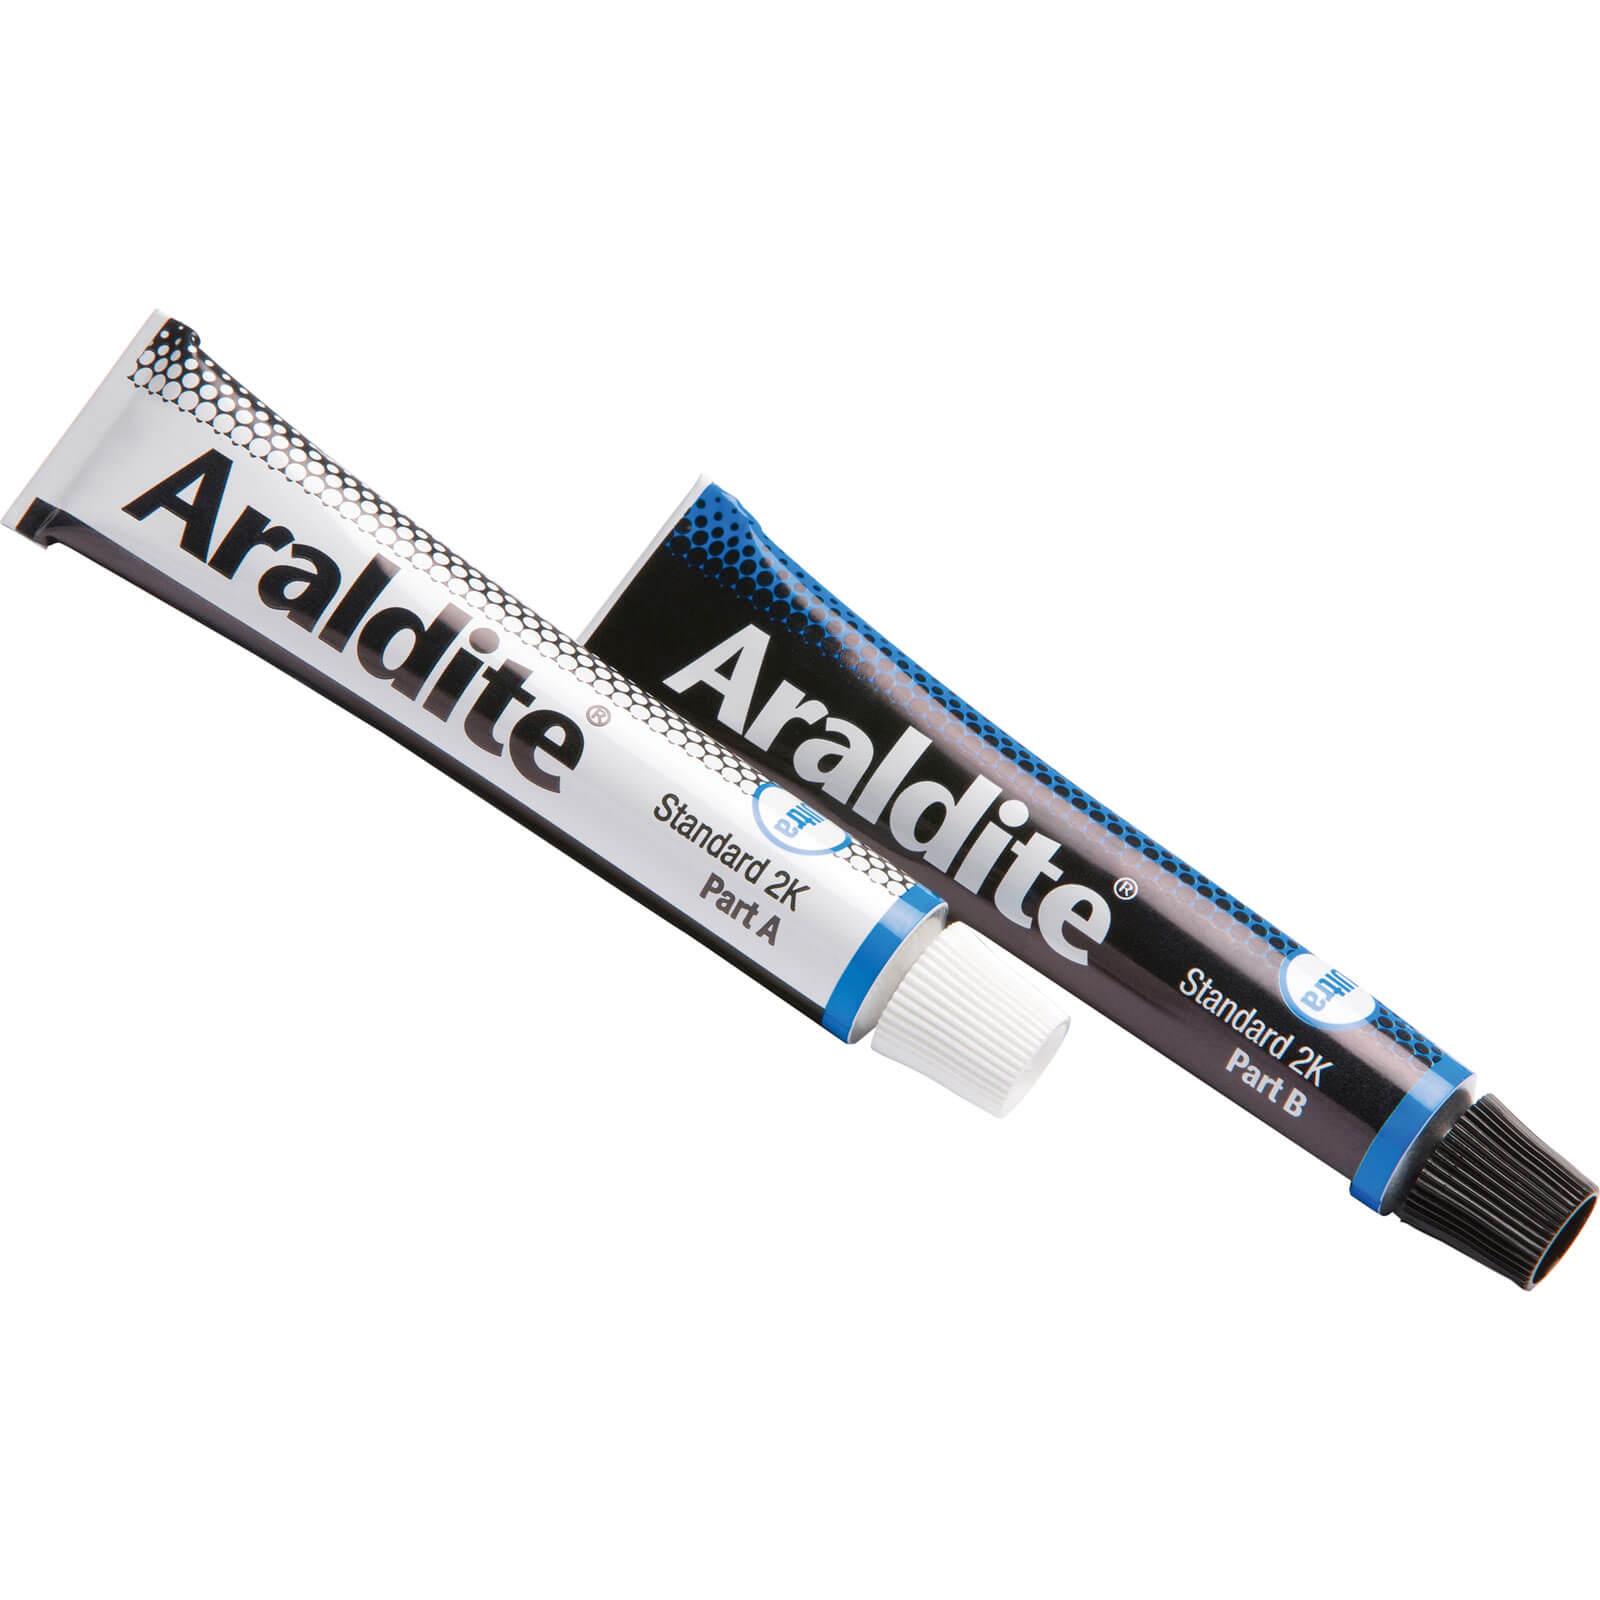 Araldite Standard Two Component Adhesive 2 x 15ml Tubes